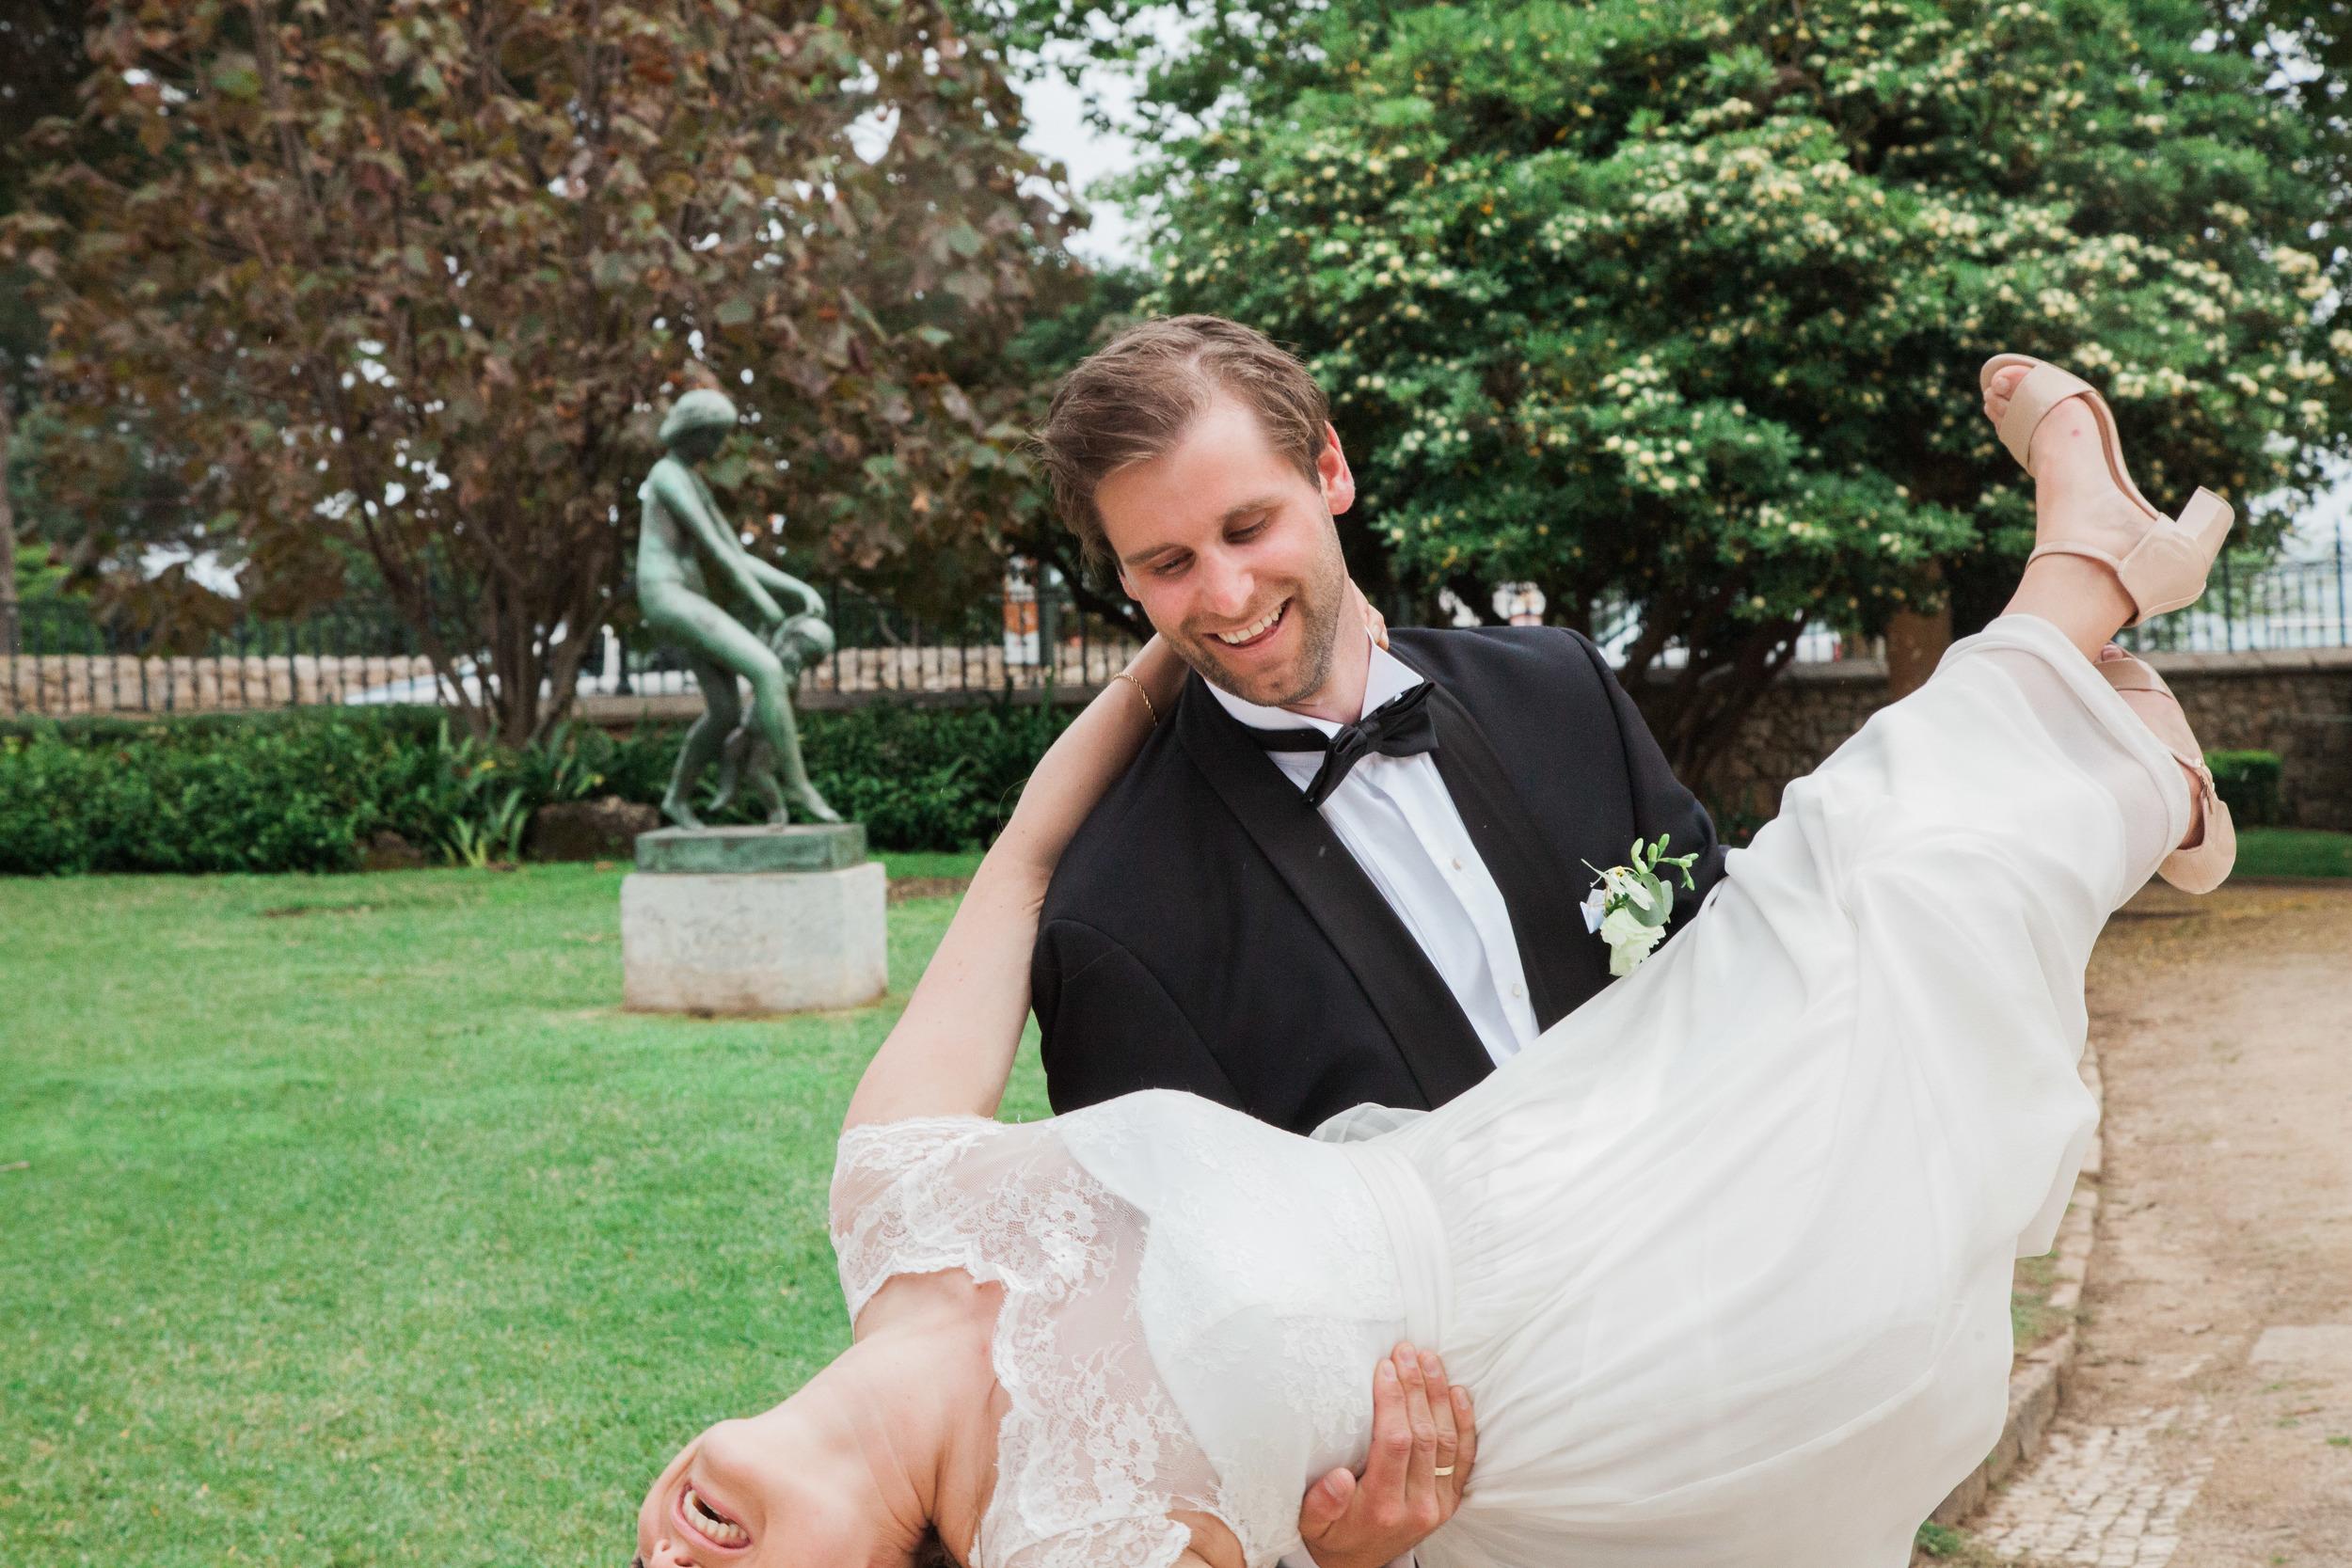 mariarao+wedding+portugal+cascais-528.jpg